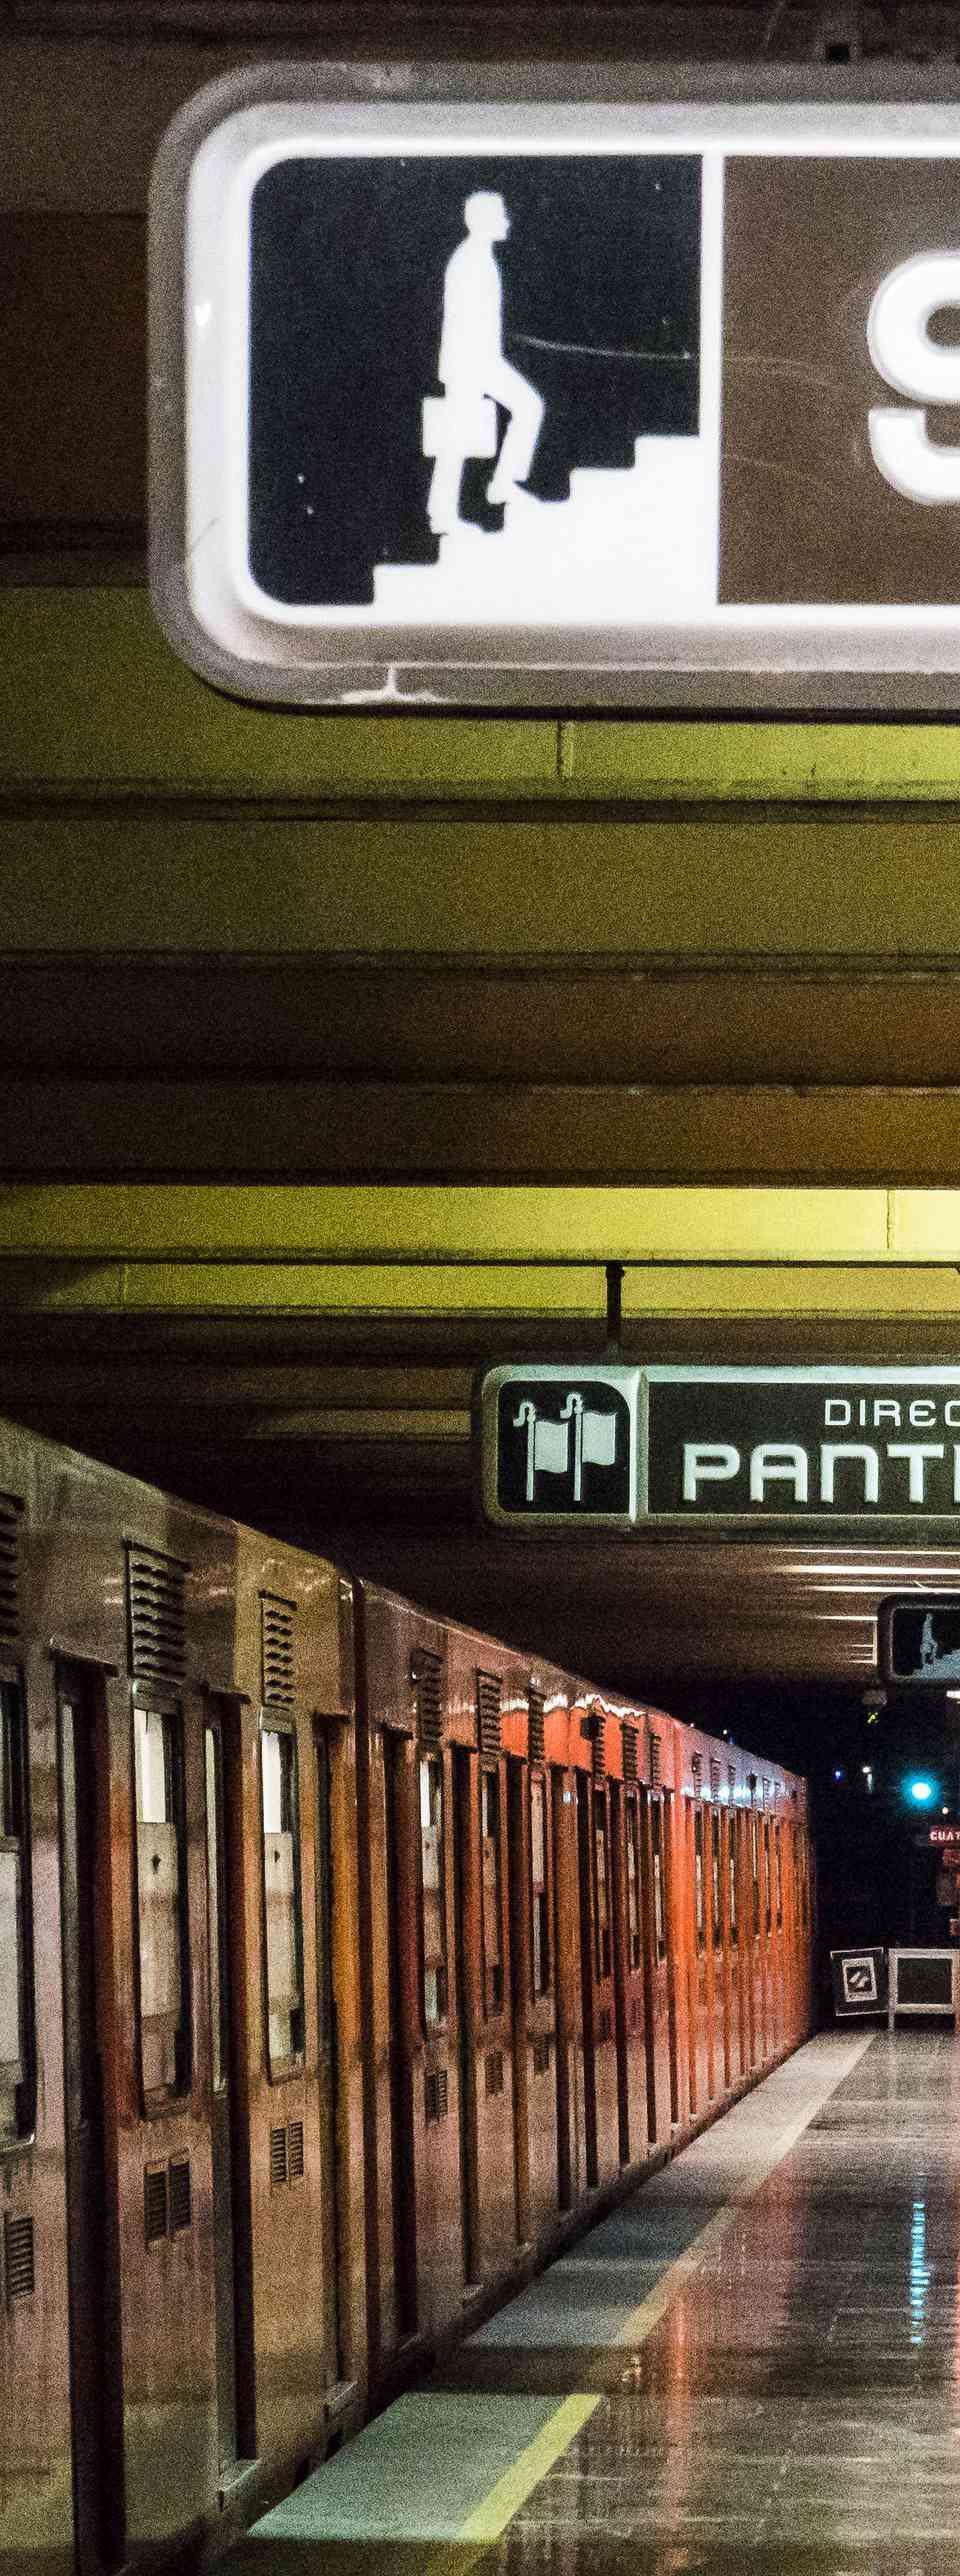 The Metro Transport System, Mexico City, Mexico